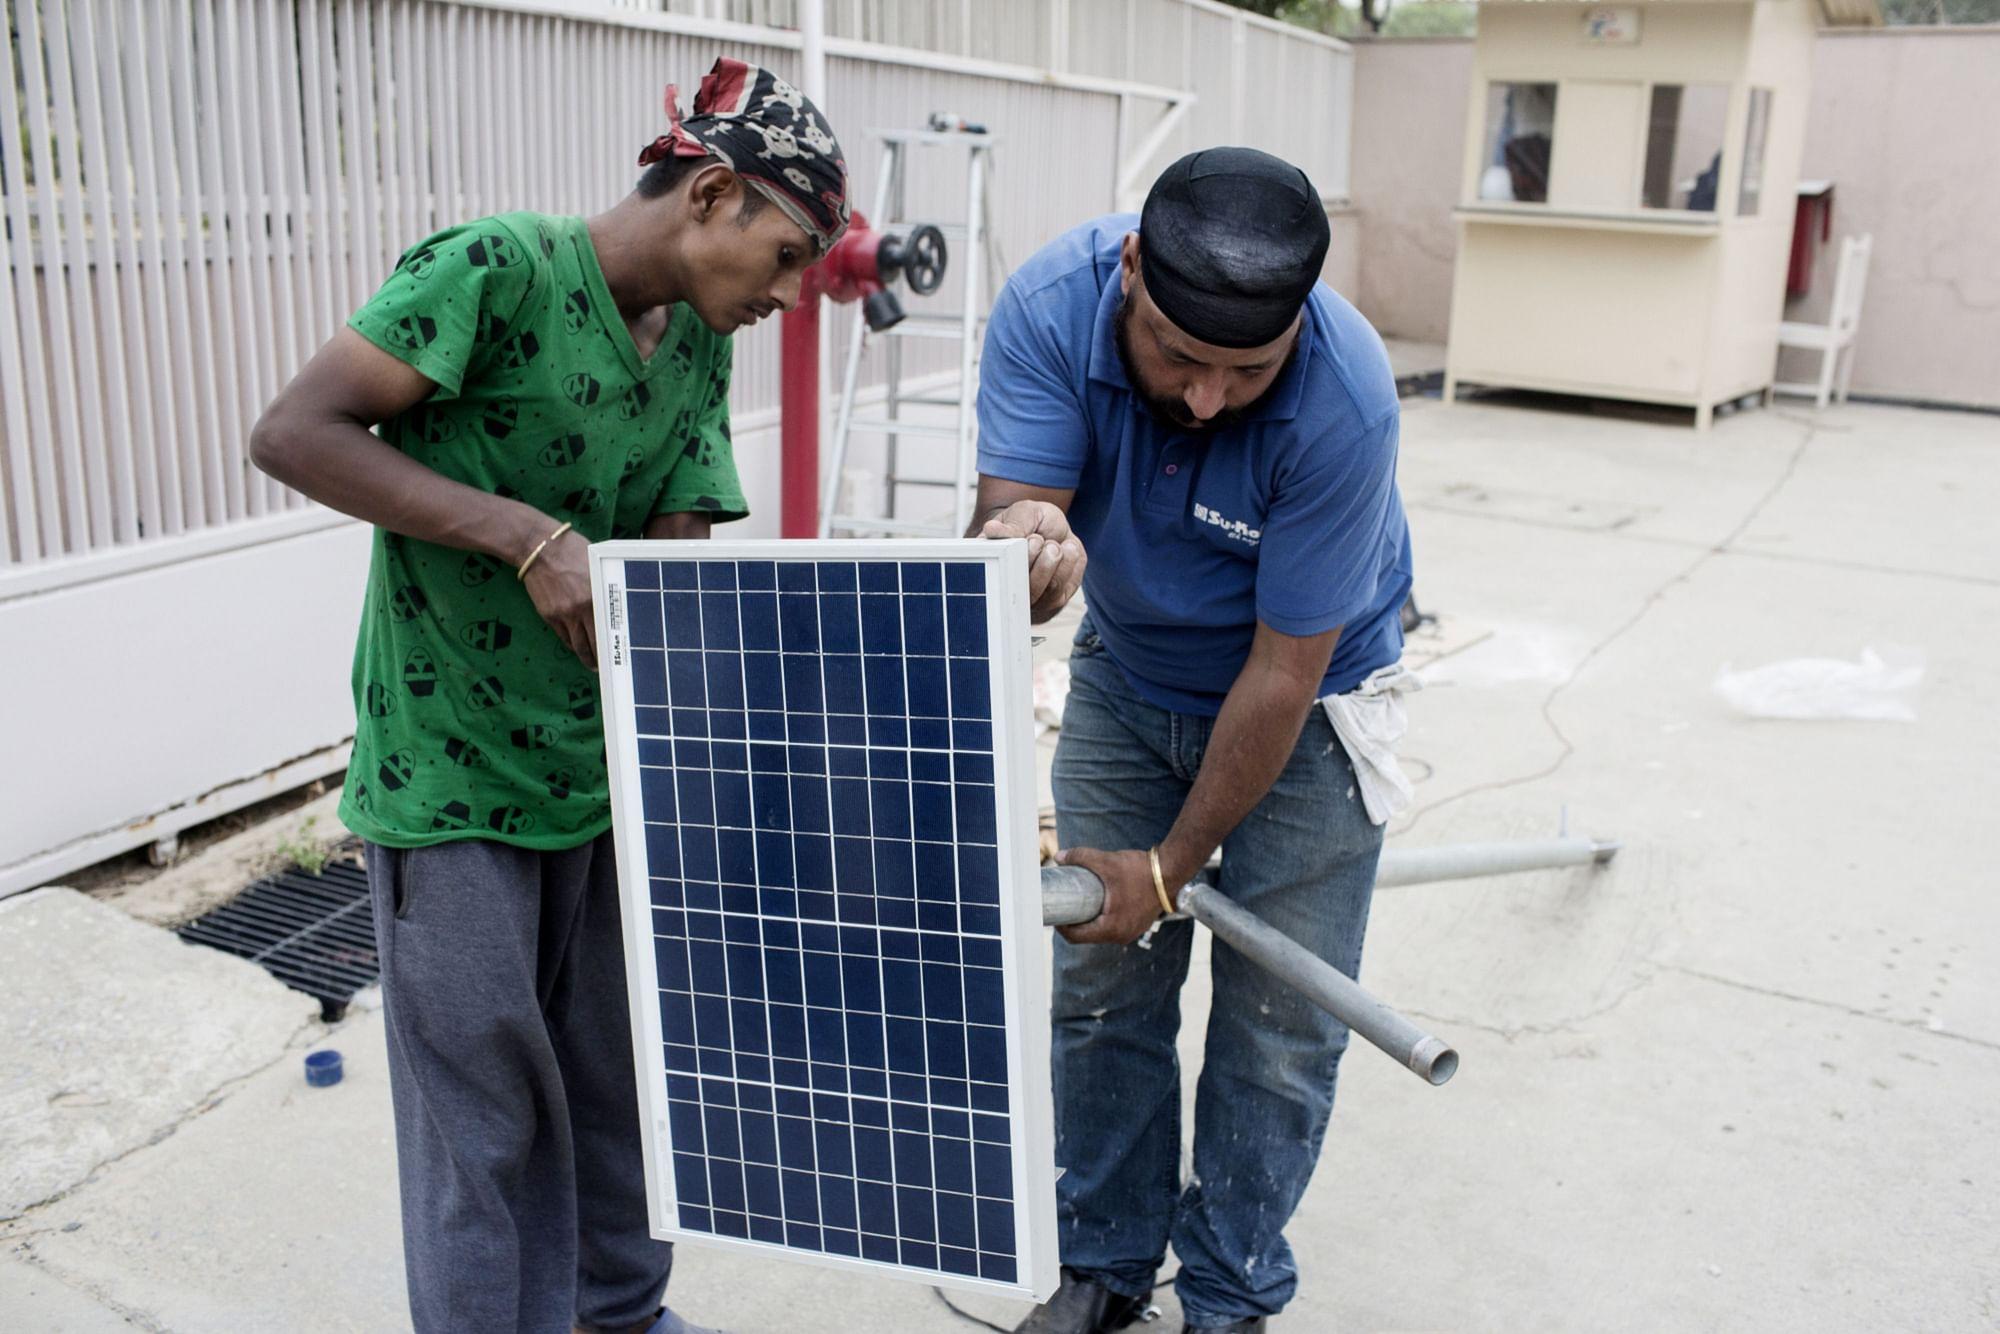 Workers install a solar panel in New Delhi. (Photographer: Udit Kulshrestha/Bloomberg)